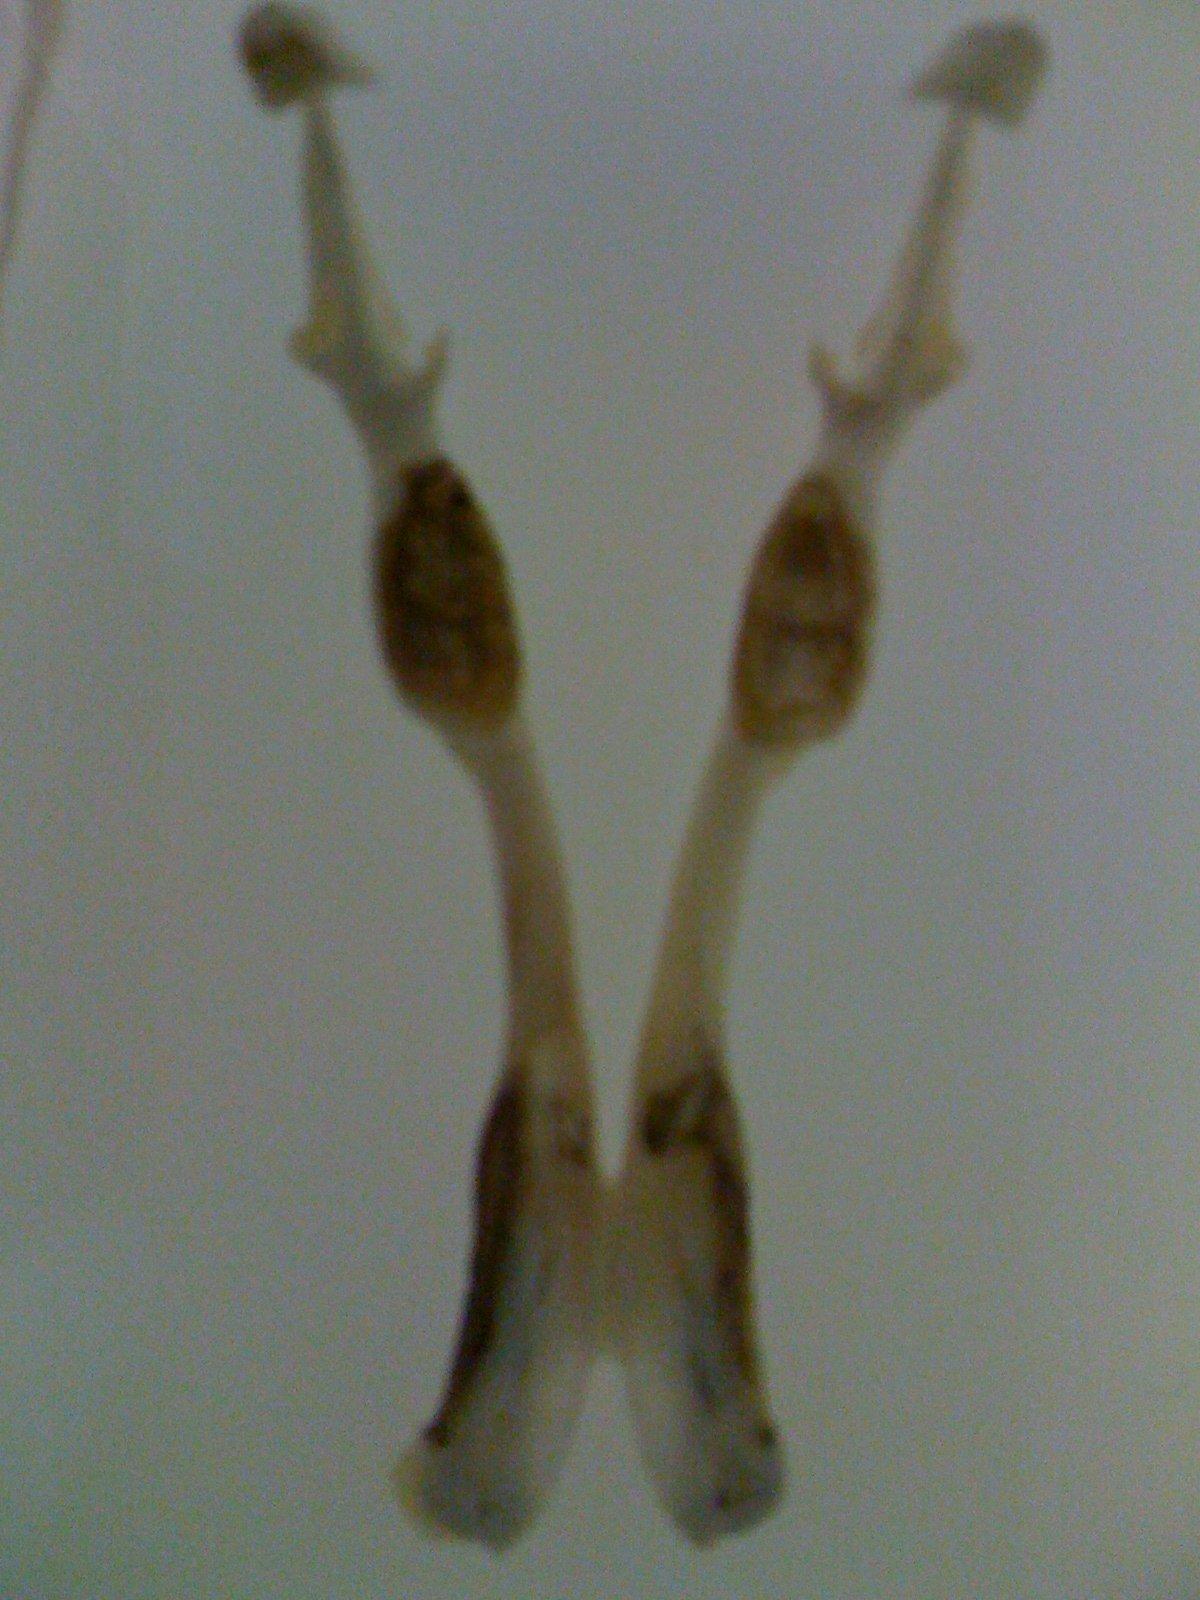 Lower jaw of platypus